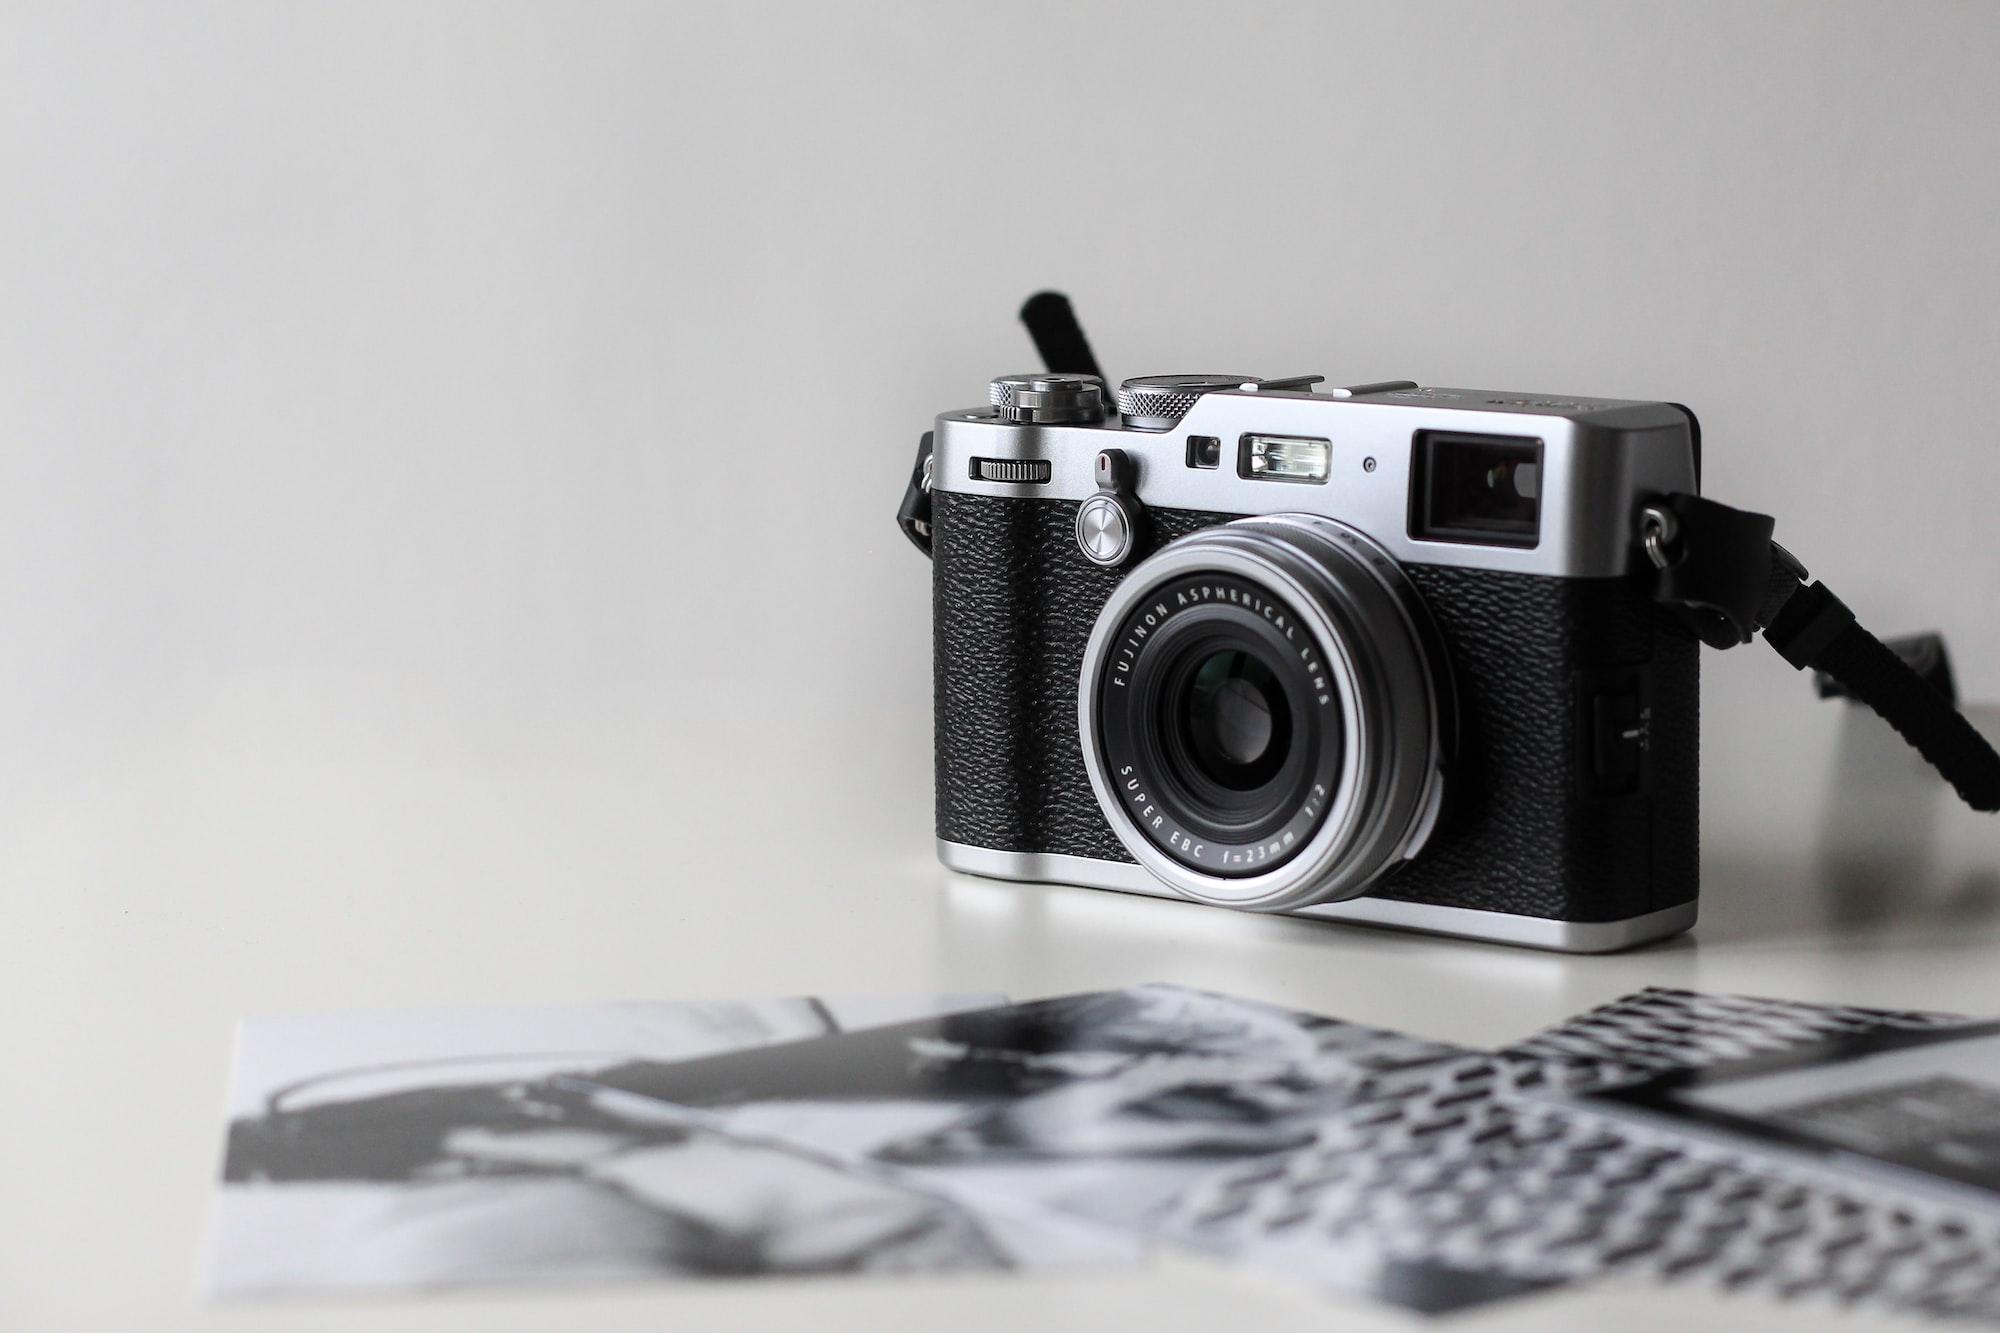 Photoshop designs for fierce bloggers > https://creativemarket.com/NordWood